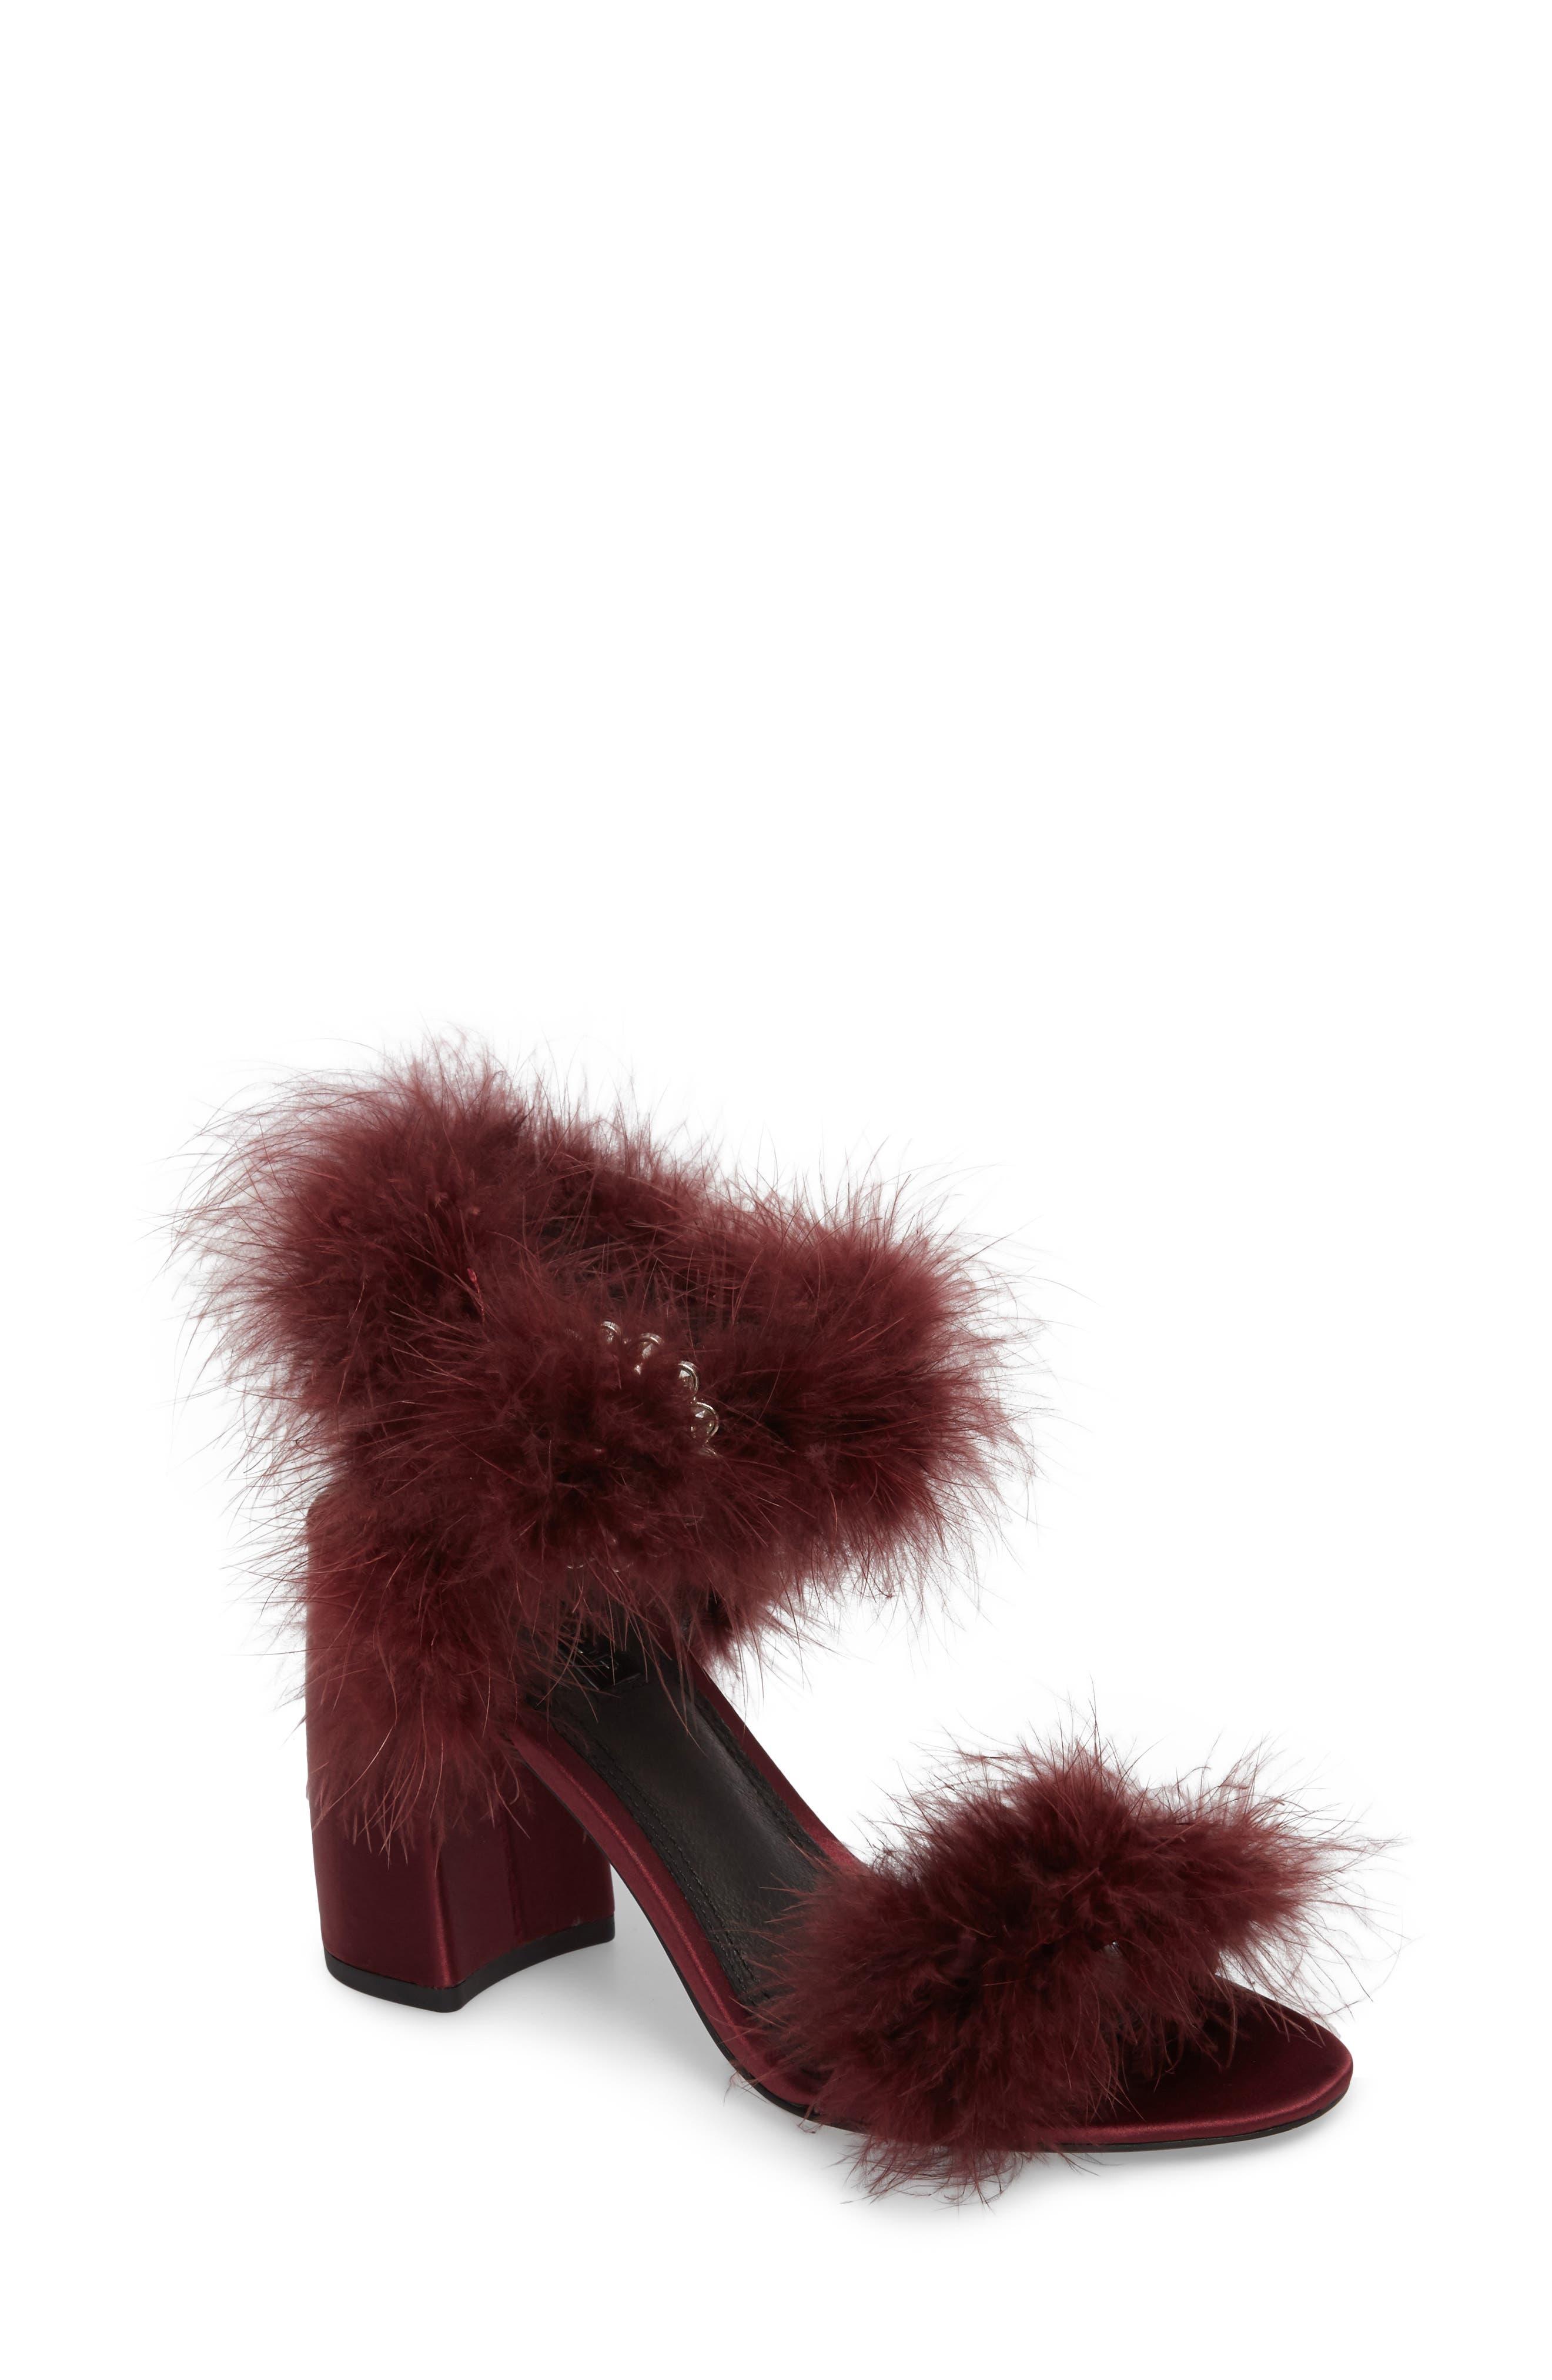 Maribou Feather Sandal,                             Main thumbnail 1, color,                             930